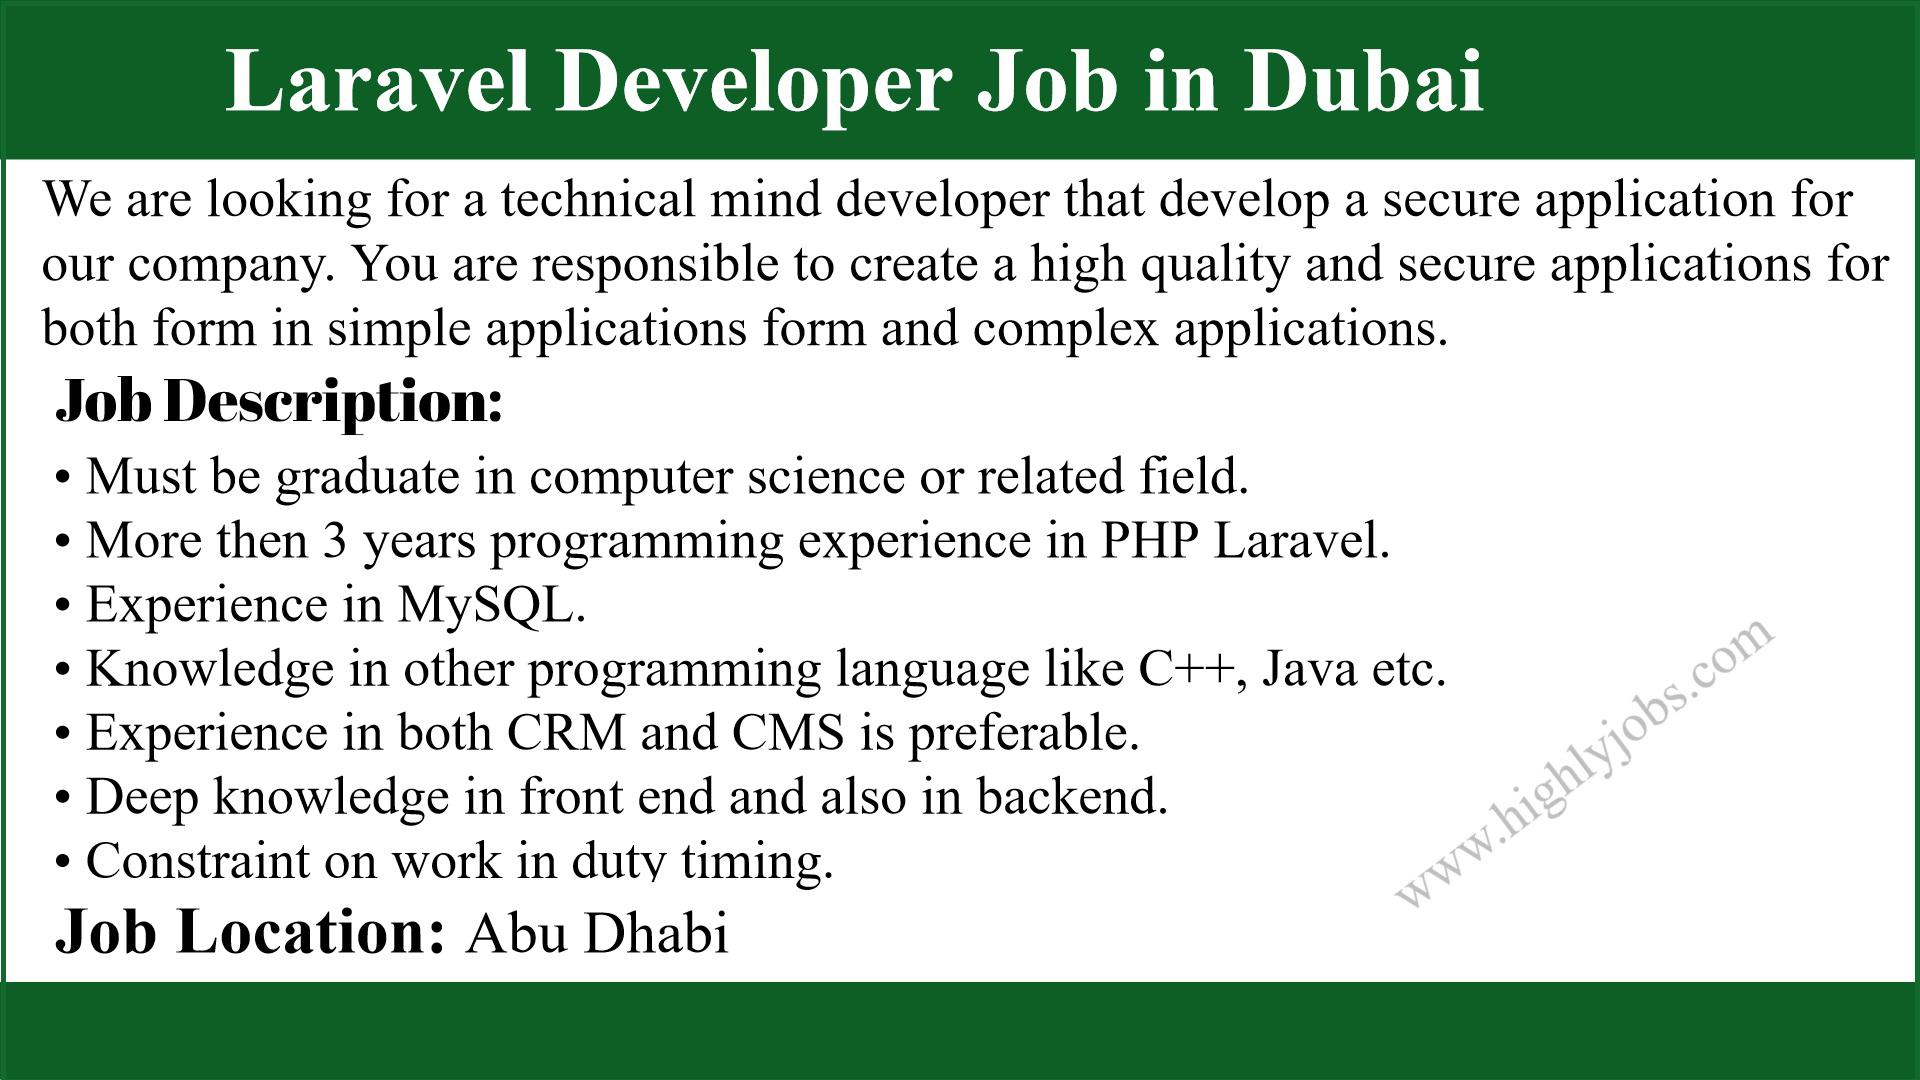 Laravel-Developer-Job-in-Dubai Job Application Form Work Experience on work experience cv, work study application form, contract employee agreement form, employment contract form,